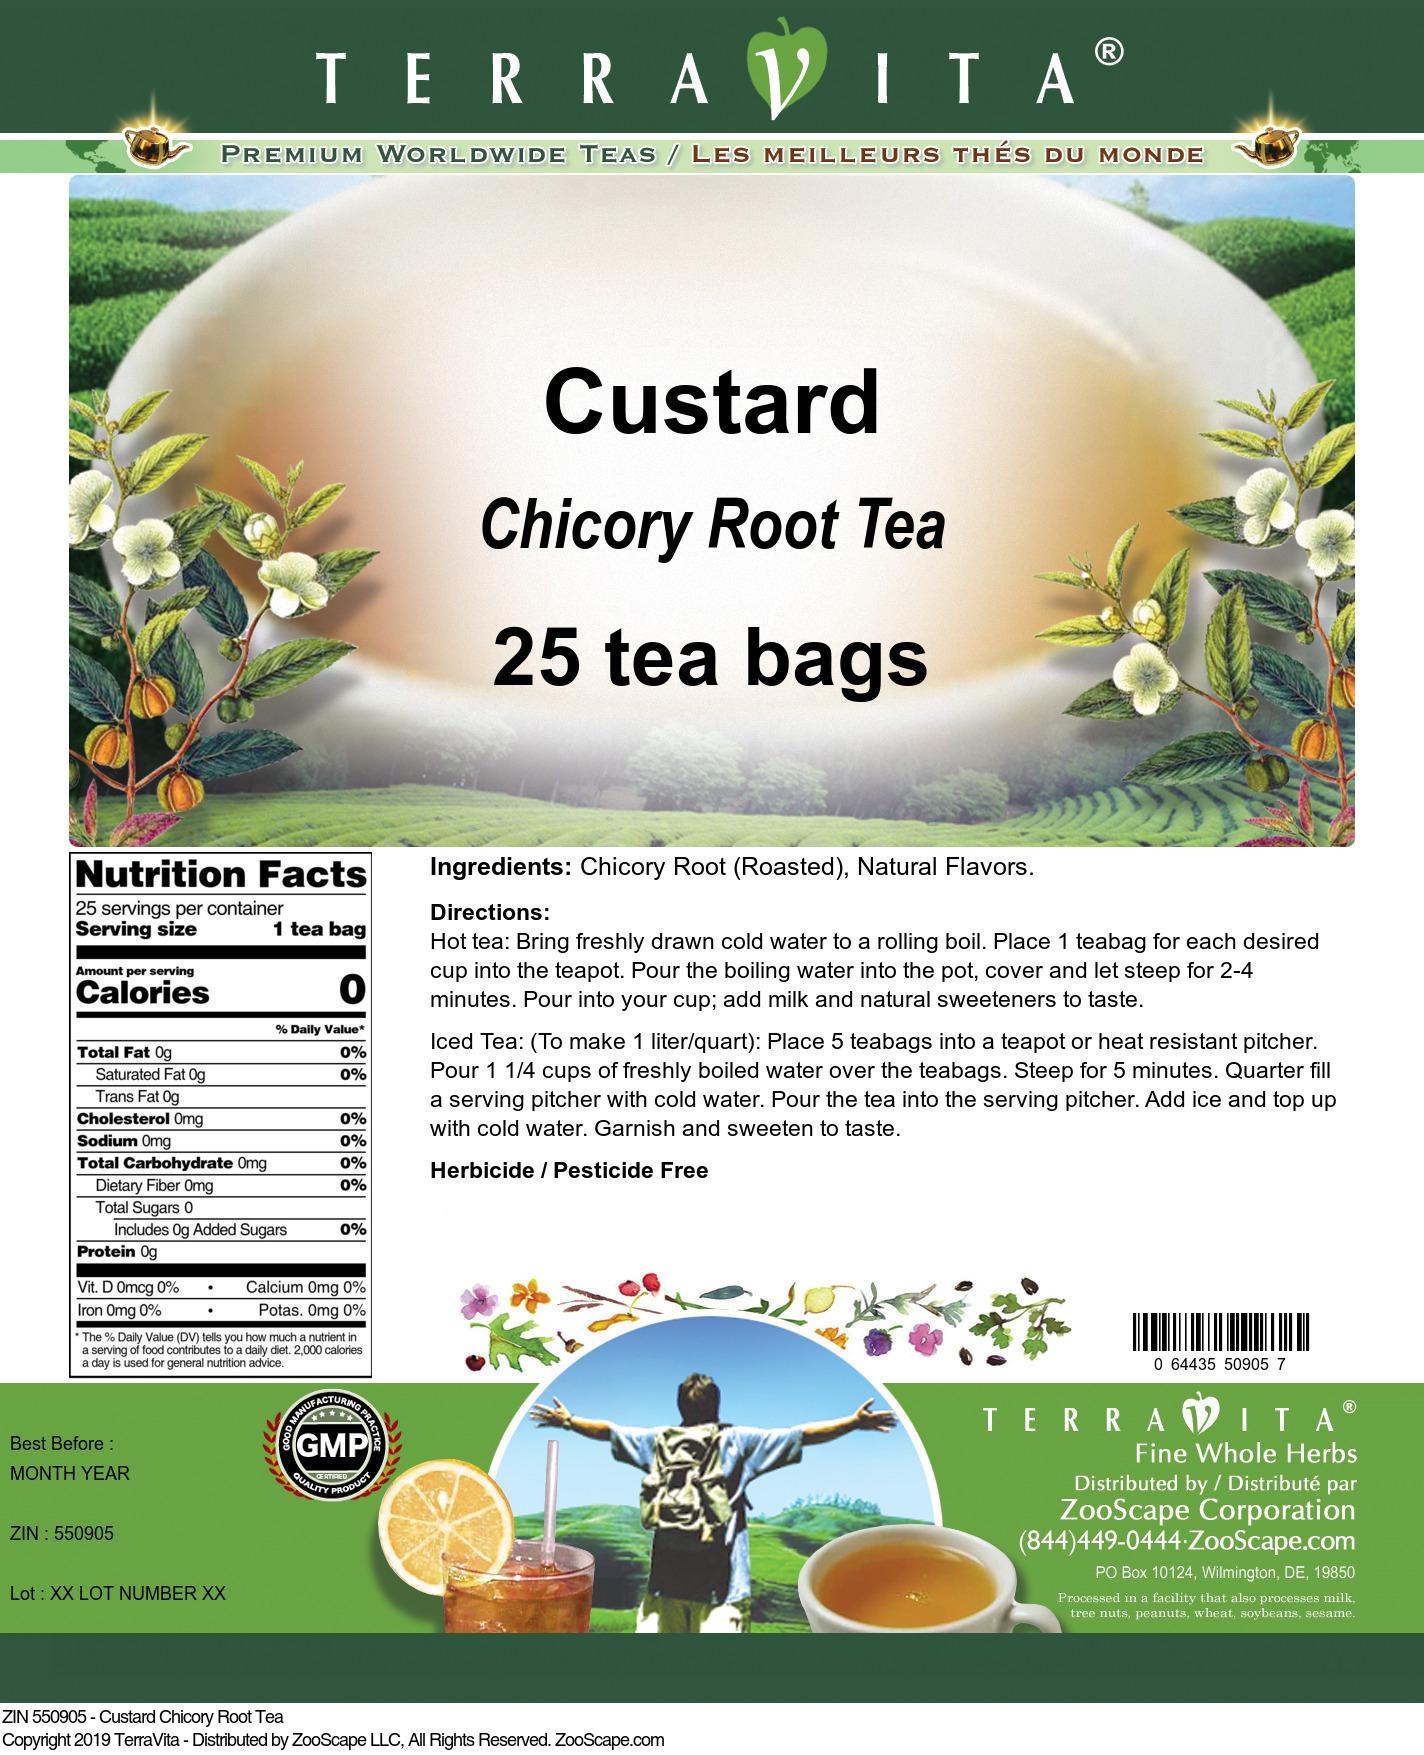 Custard Chicory Root Tea